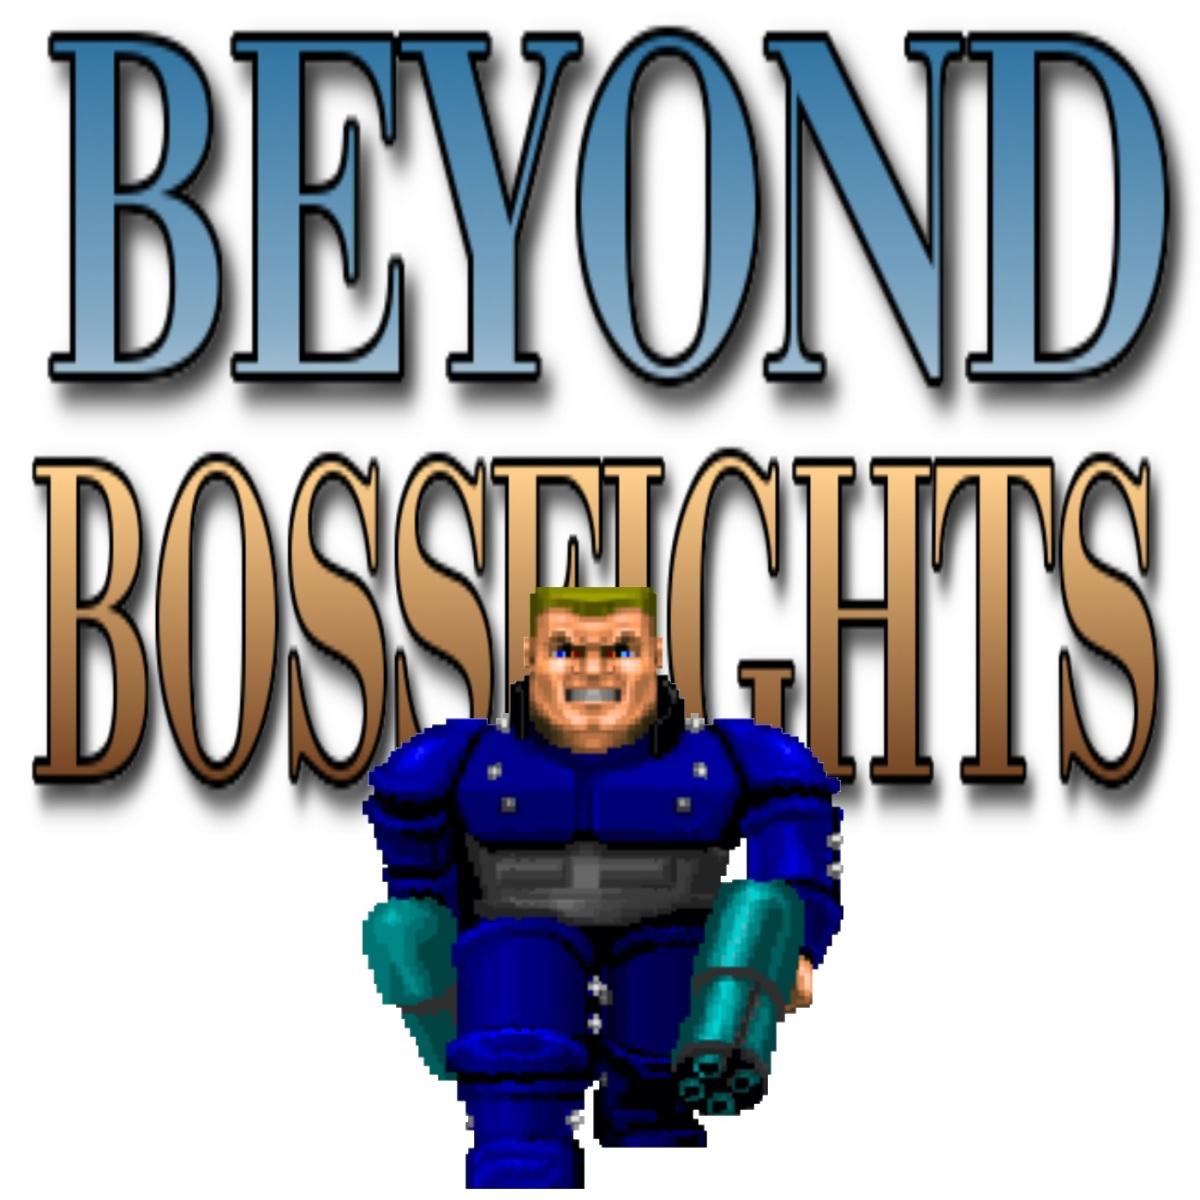 Beyond Bossfights Episode 32